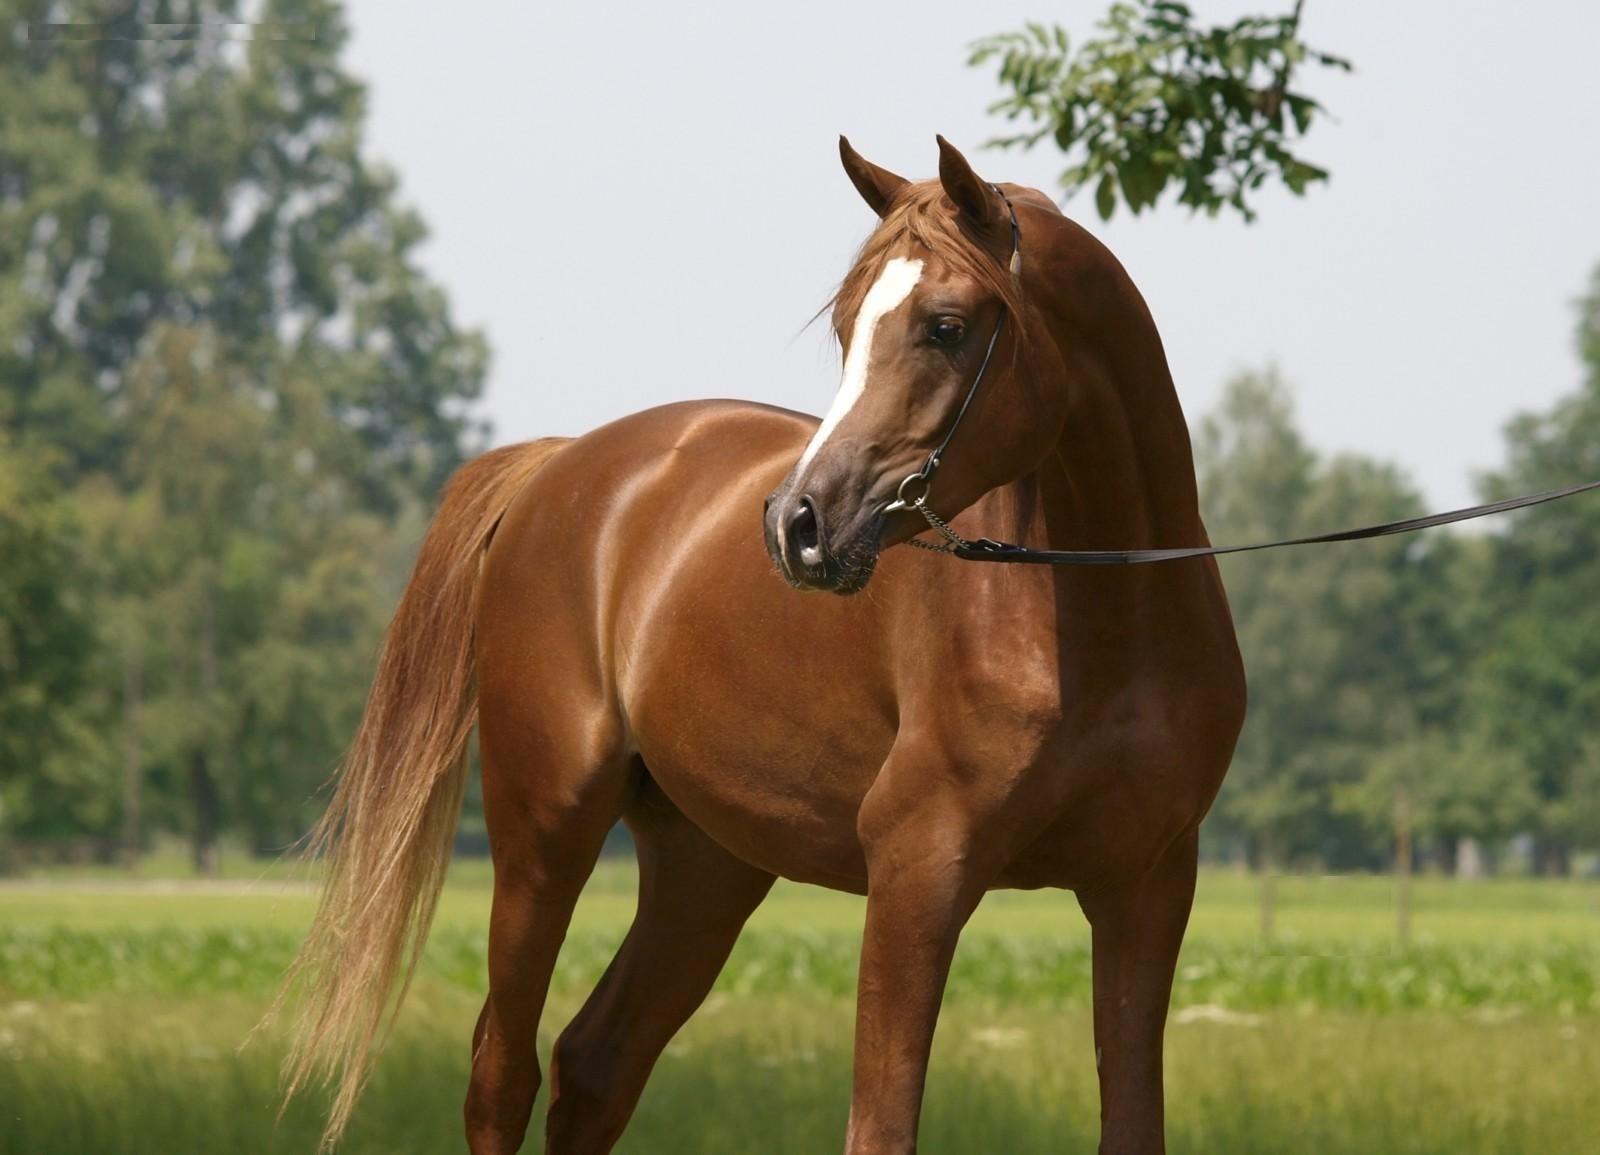 Fantastic Wallpaper Horse Windows - 497bcd0df4a5d0a7c1e048b38a1e41ff  Photograph_85837.jpg